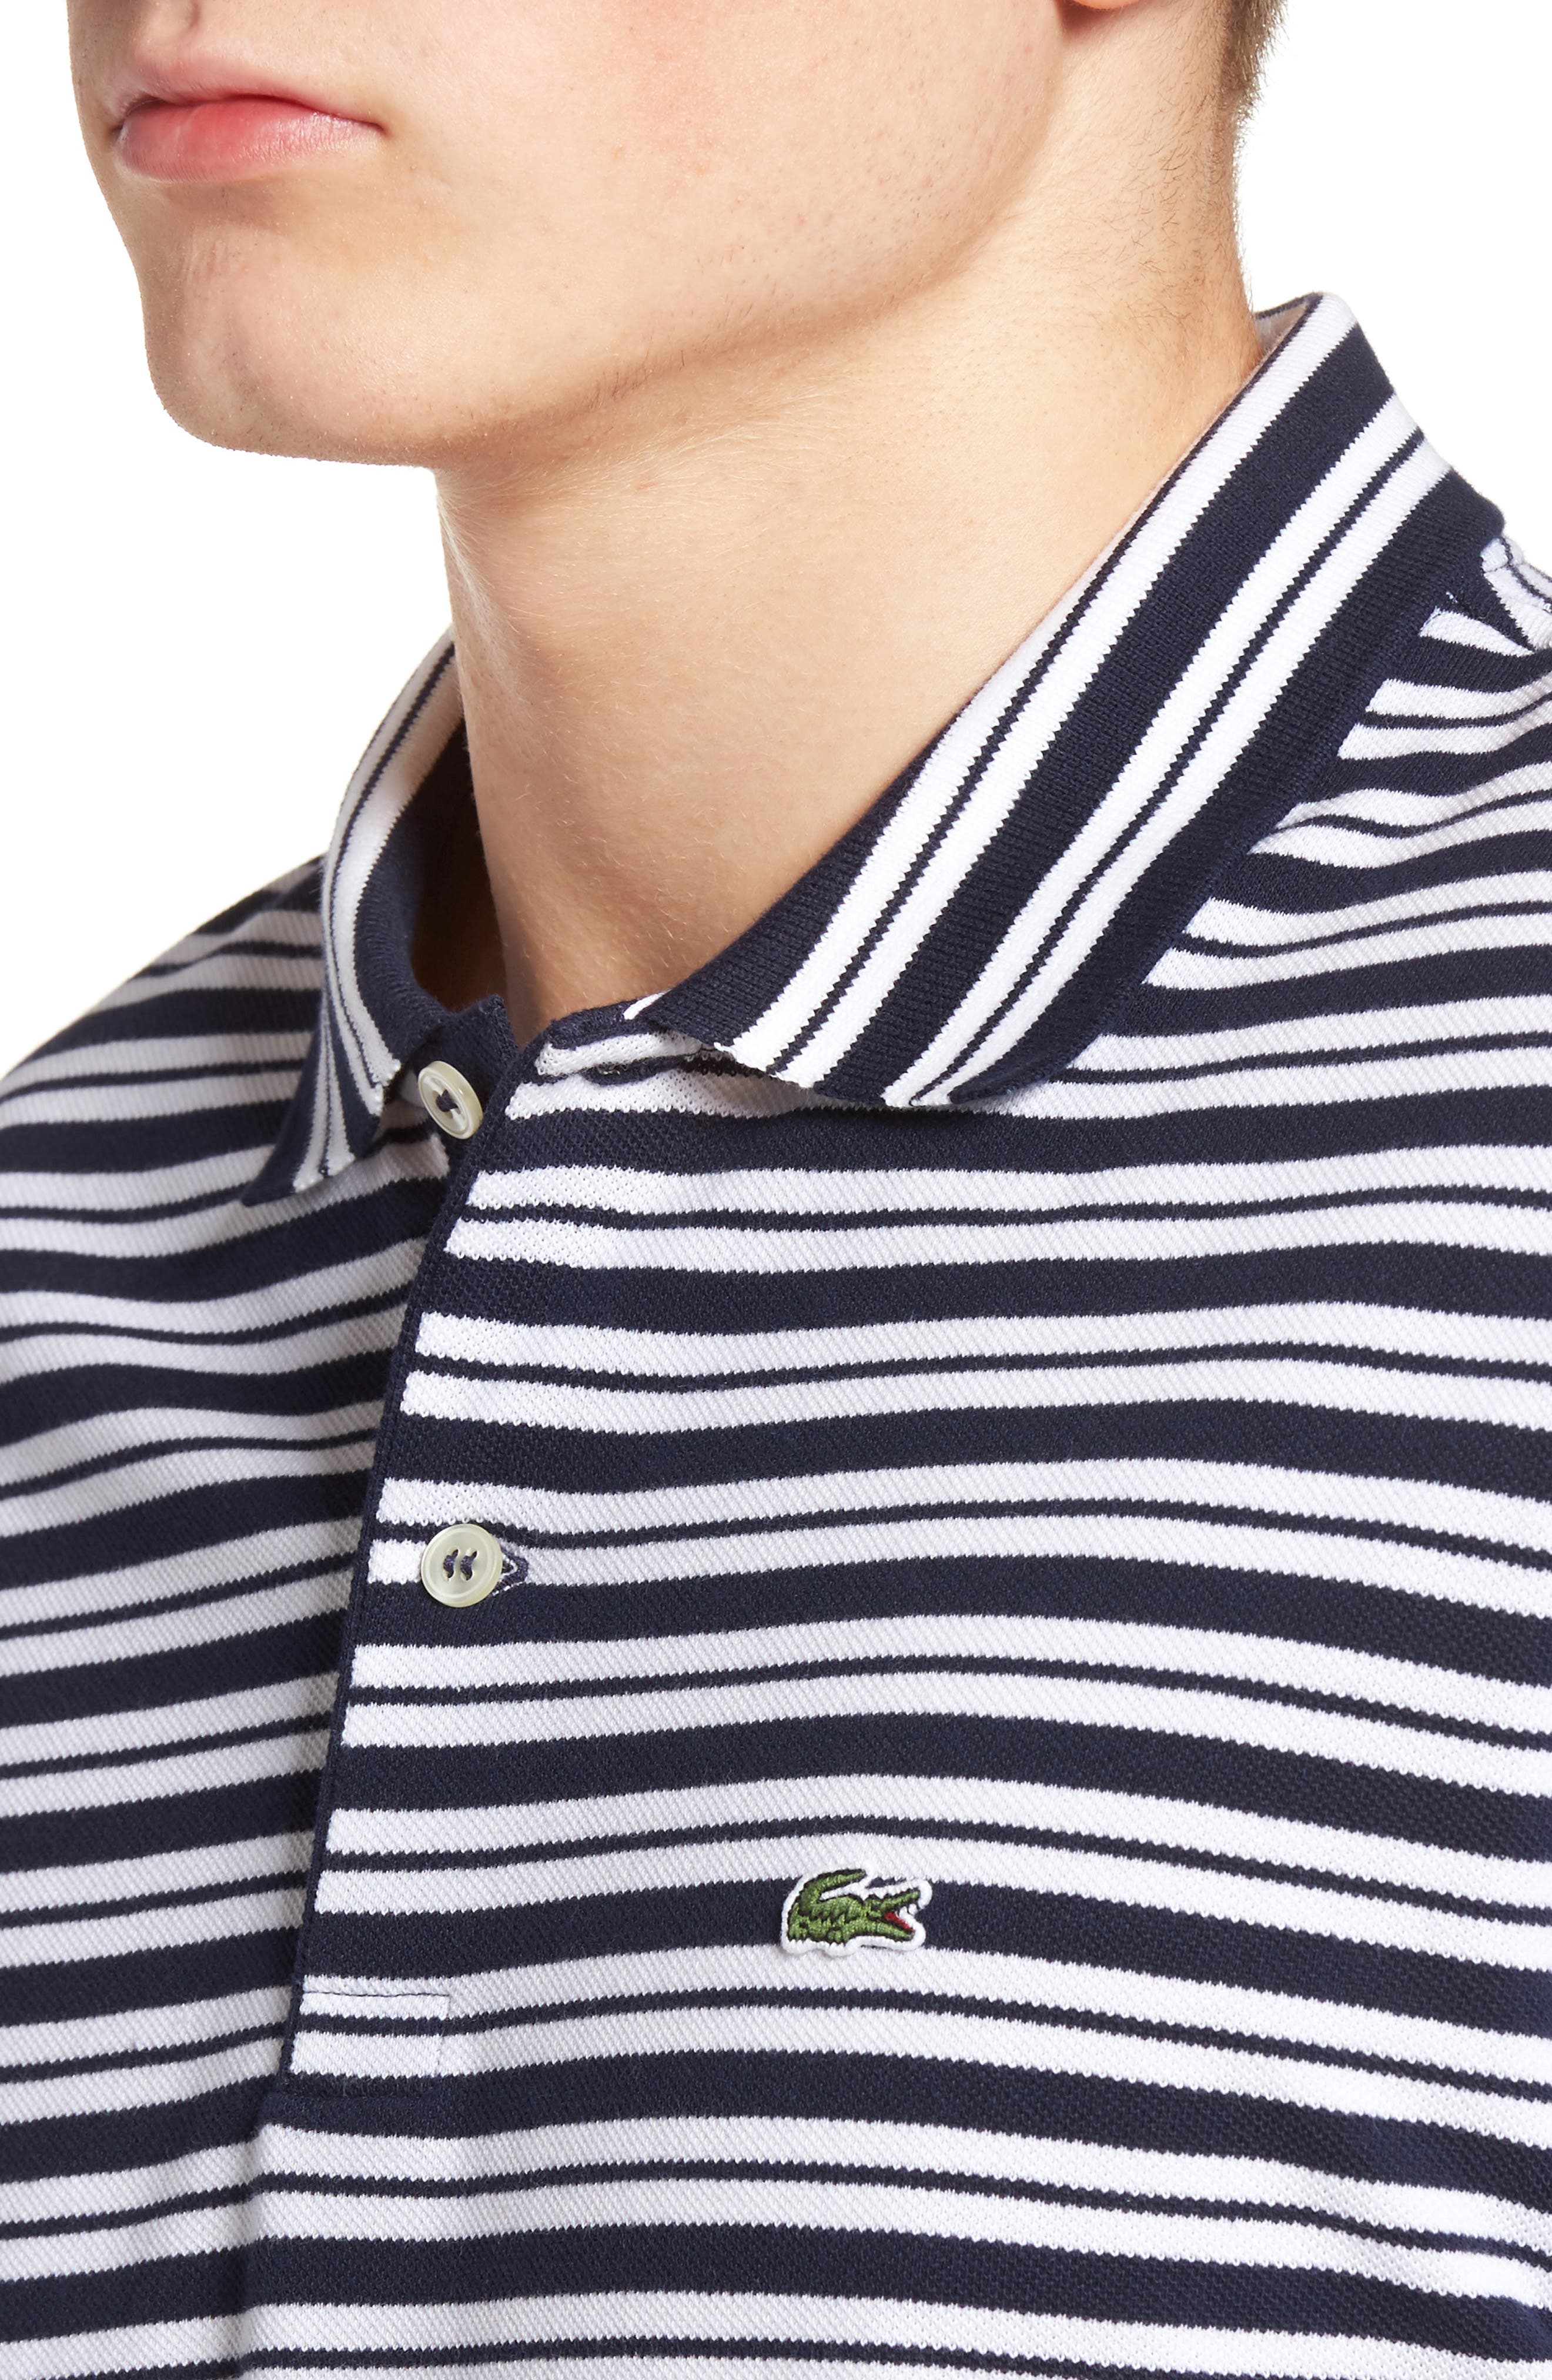 Striped Polo,                             Alternate thumbnail 4, color,                             Navy Blue/ White